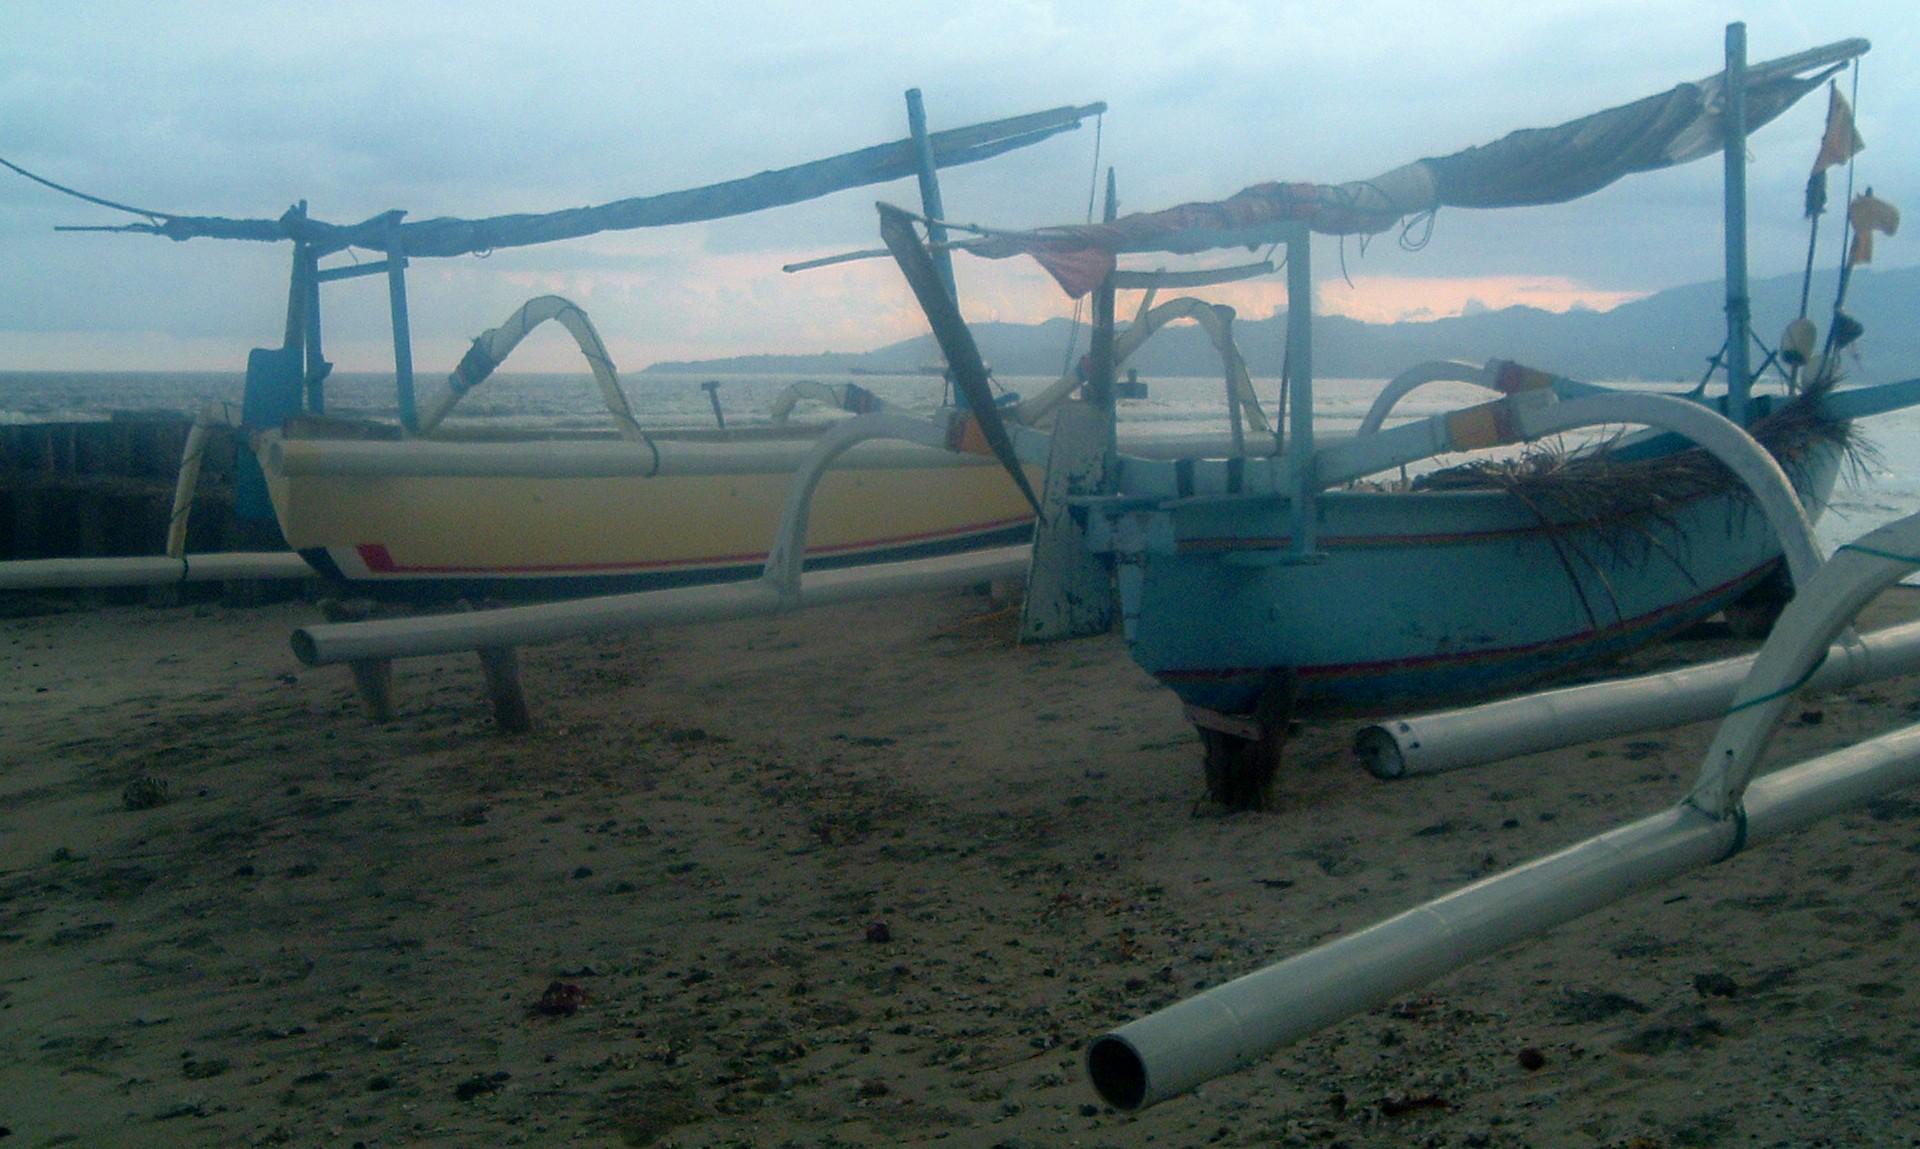 balinese boats.JPG